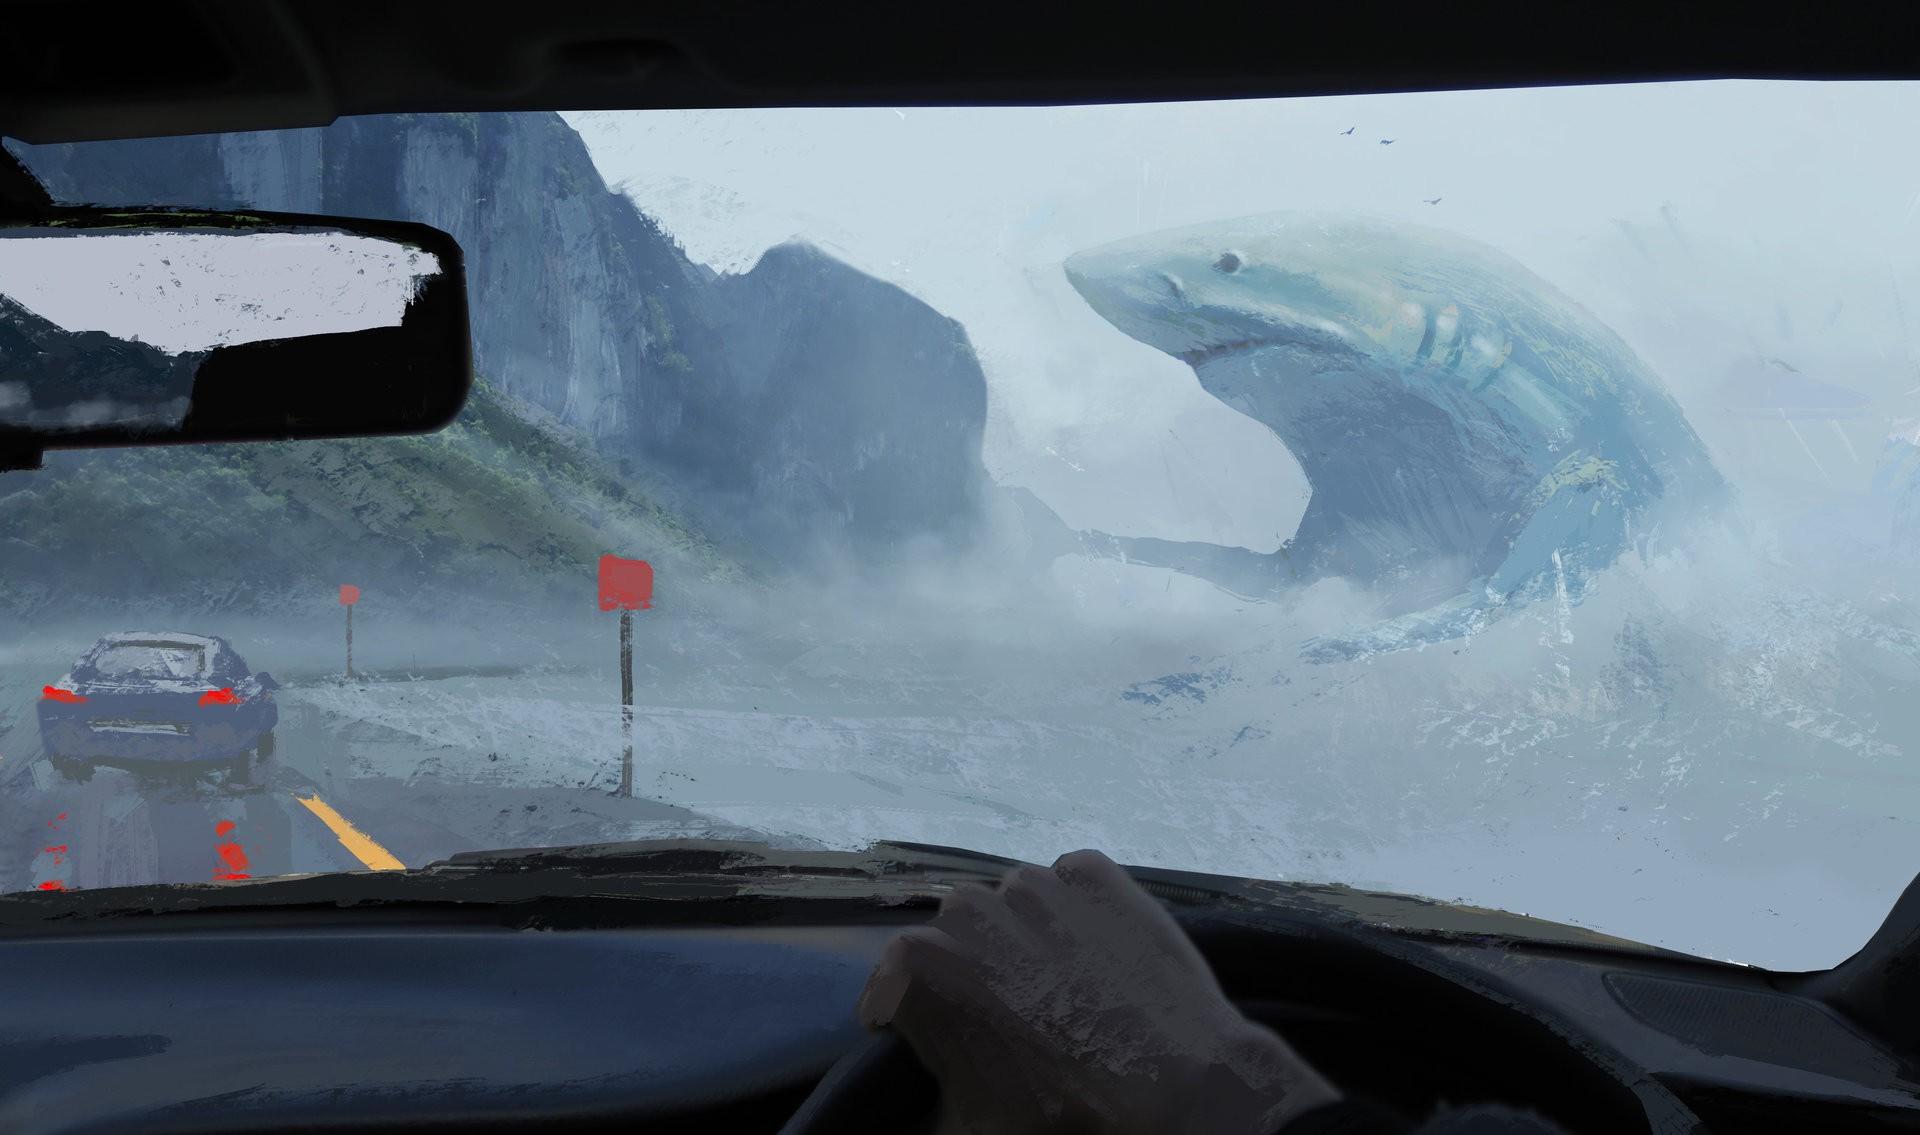 wallpaper painting digital art animals fantasy art sea shark snow vehicle road. Black Bedroom Furniture Sets. Home Design Ideas